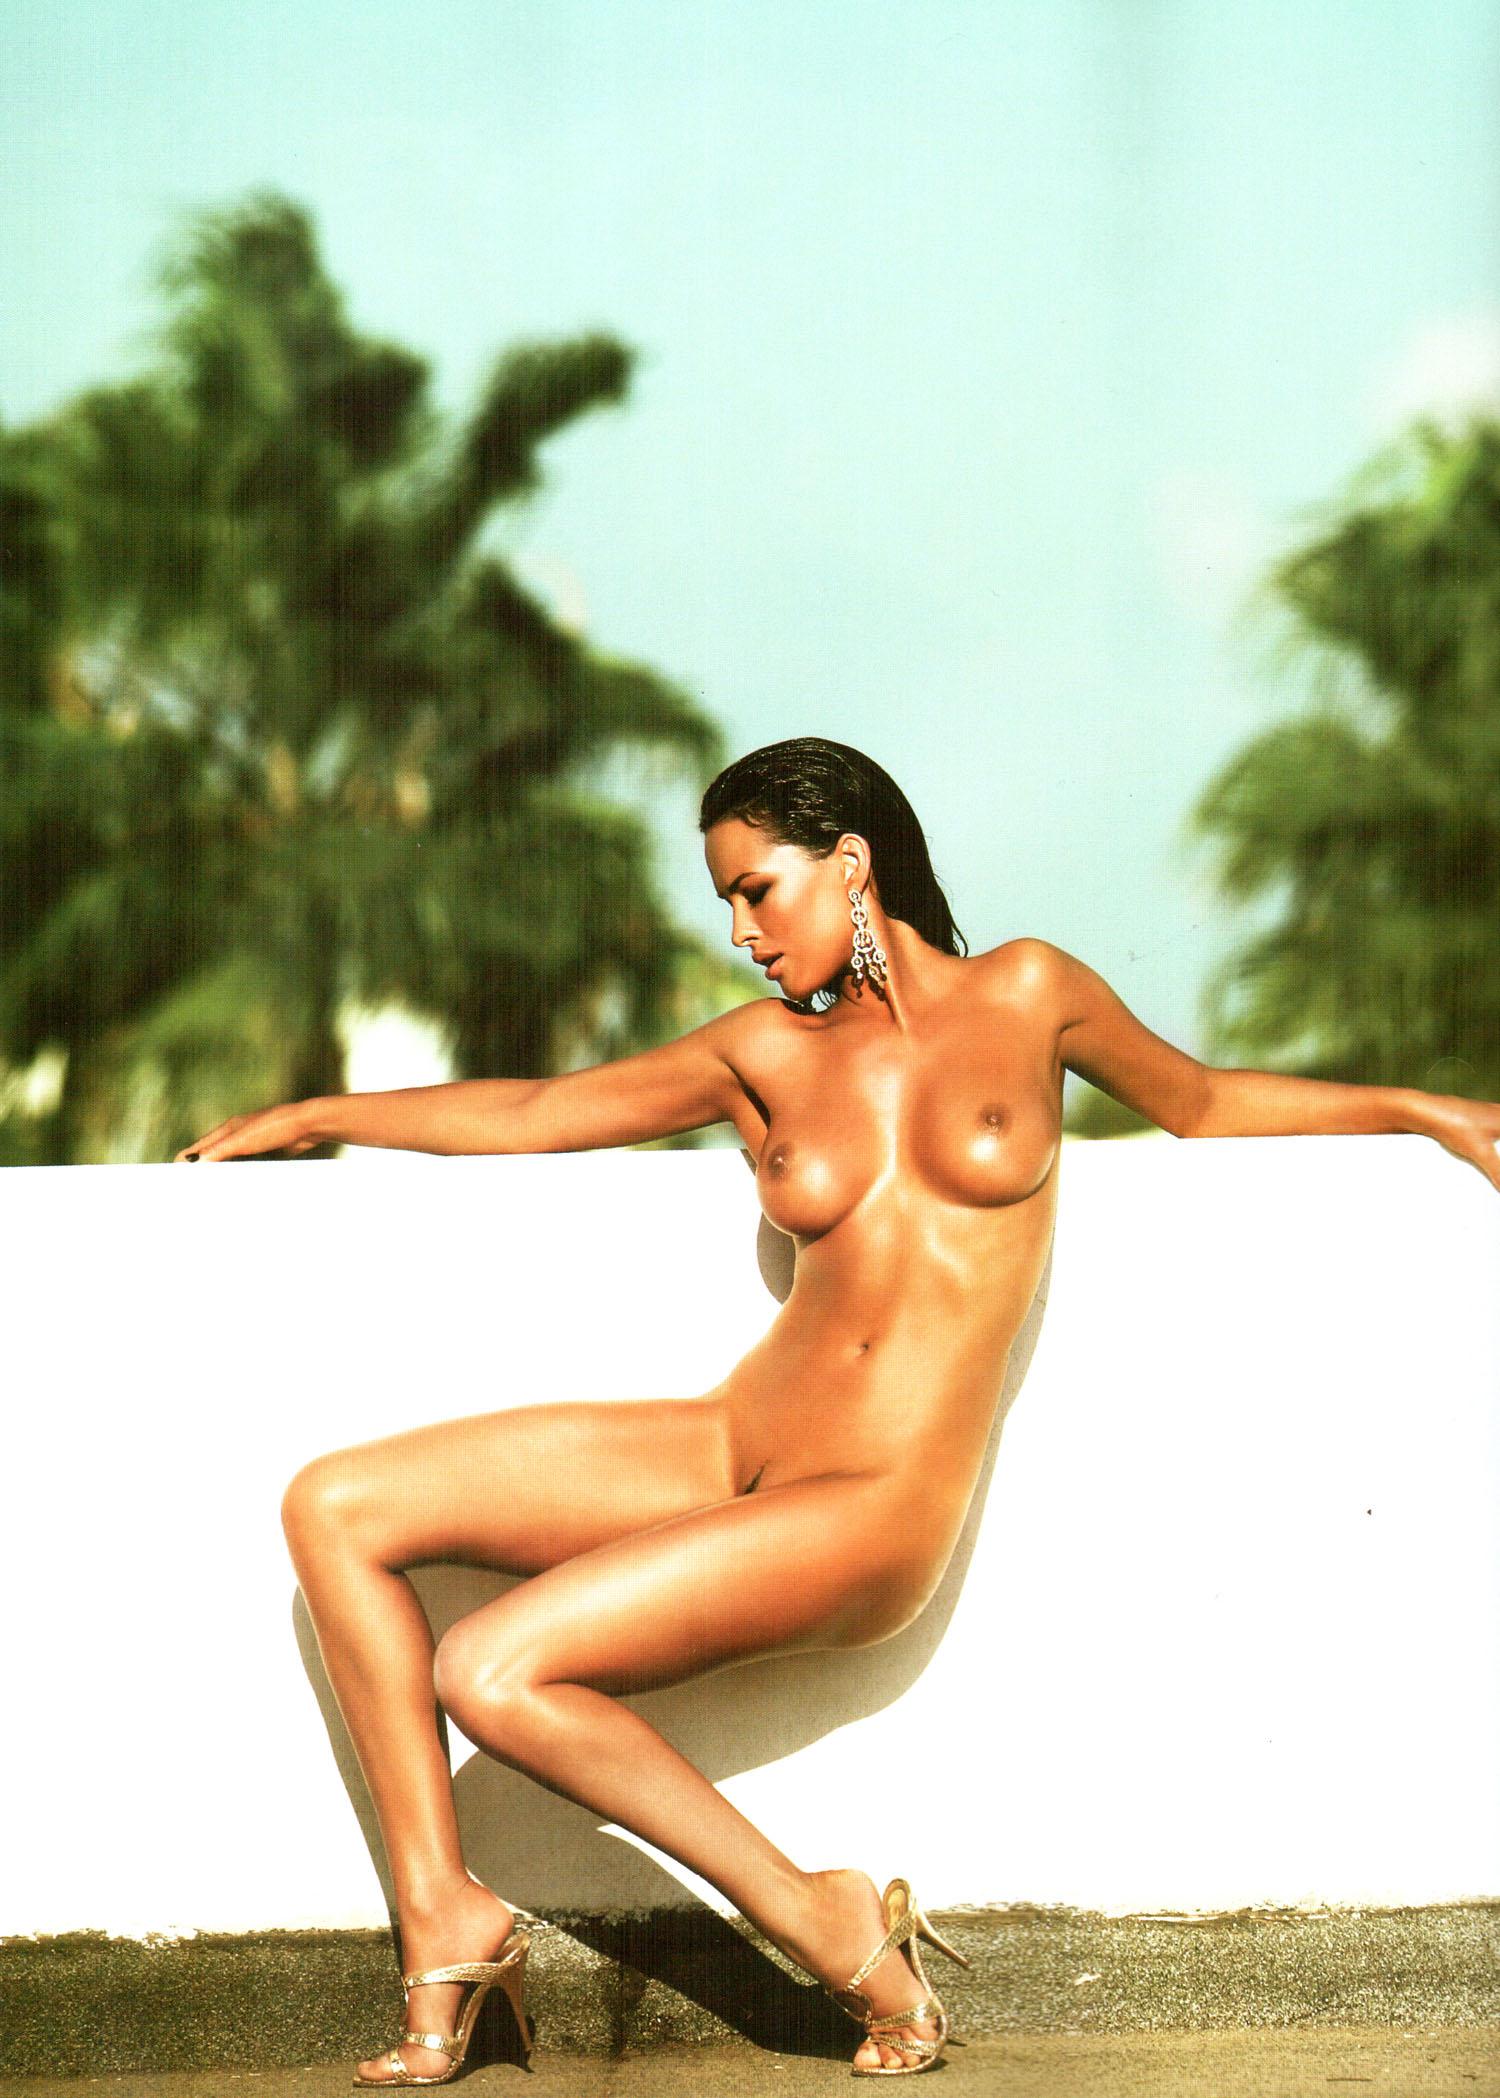 59224_Playboy_Ukraine_12-2007_6_122_20lo.jpg